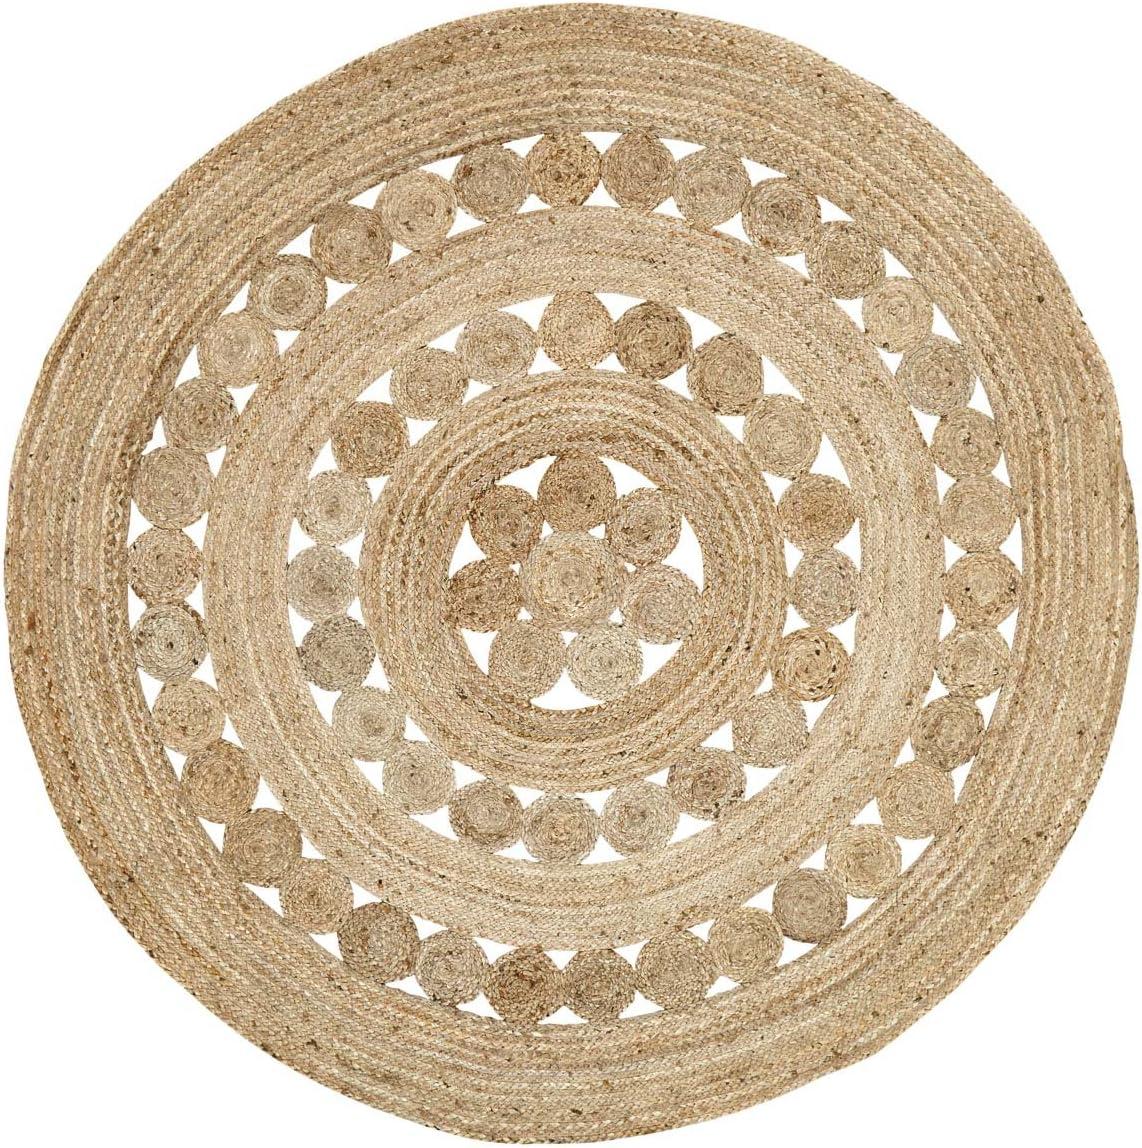 Amazon Com Coastal Farmhouse Flooring Celeste Tan Round Jute Rug 6 Diameter Furniture Decor